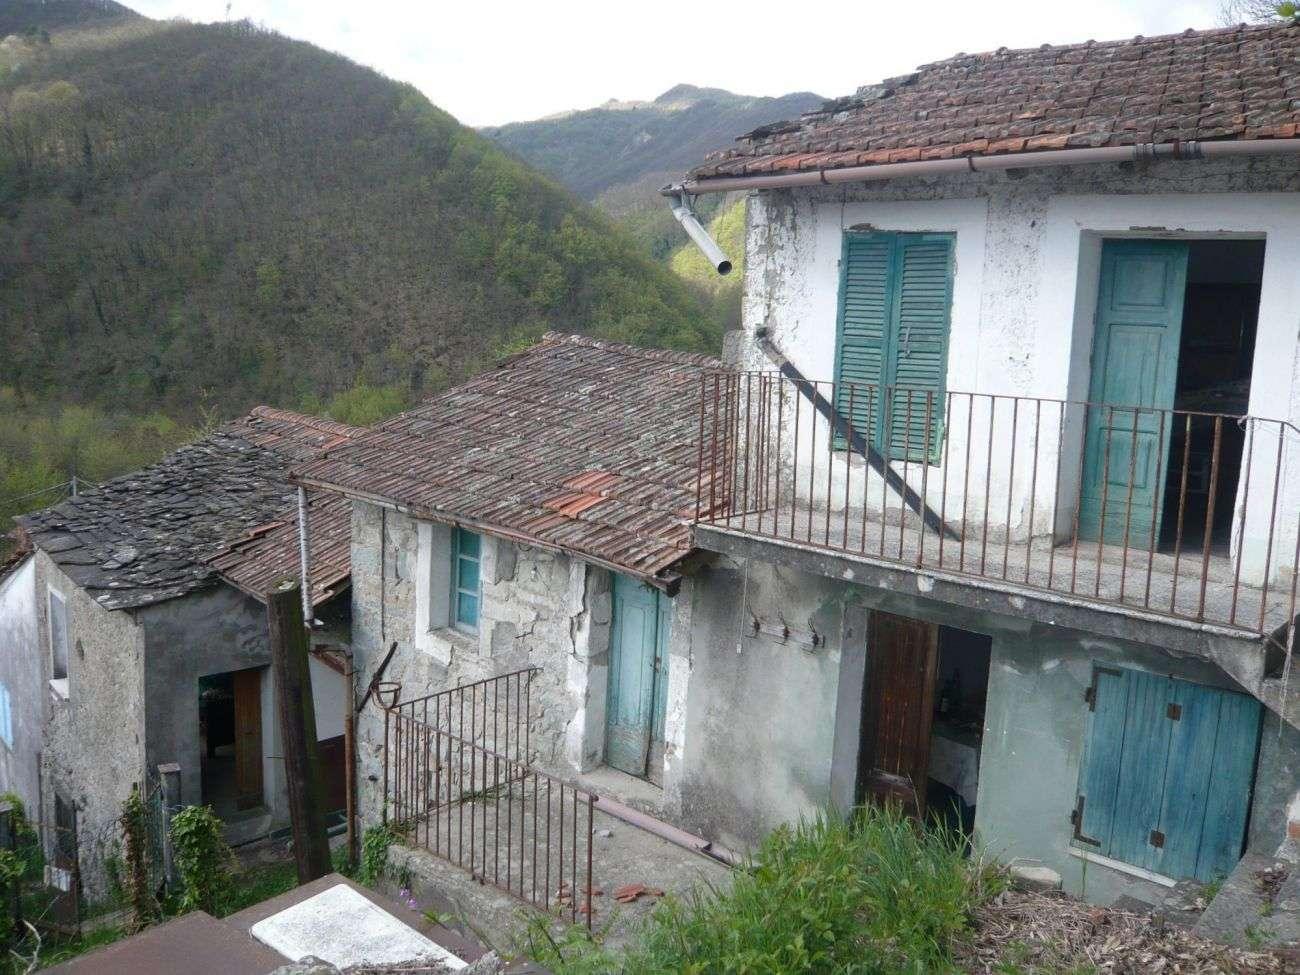 PONTREMOLI COLLINE – RUSTIC ON FOUR LEVELS